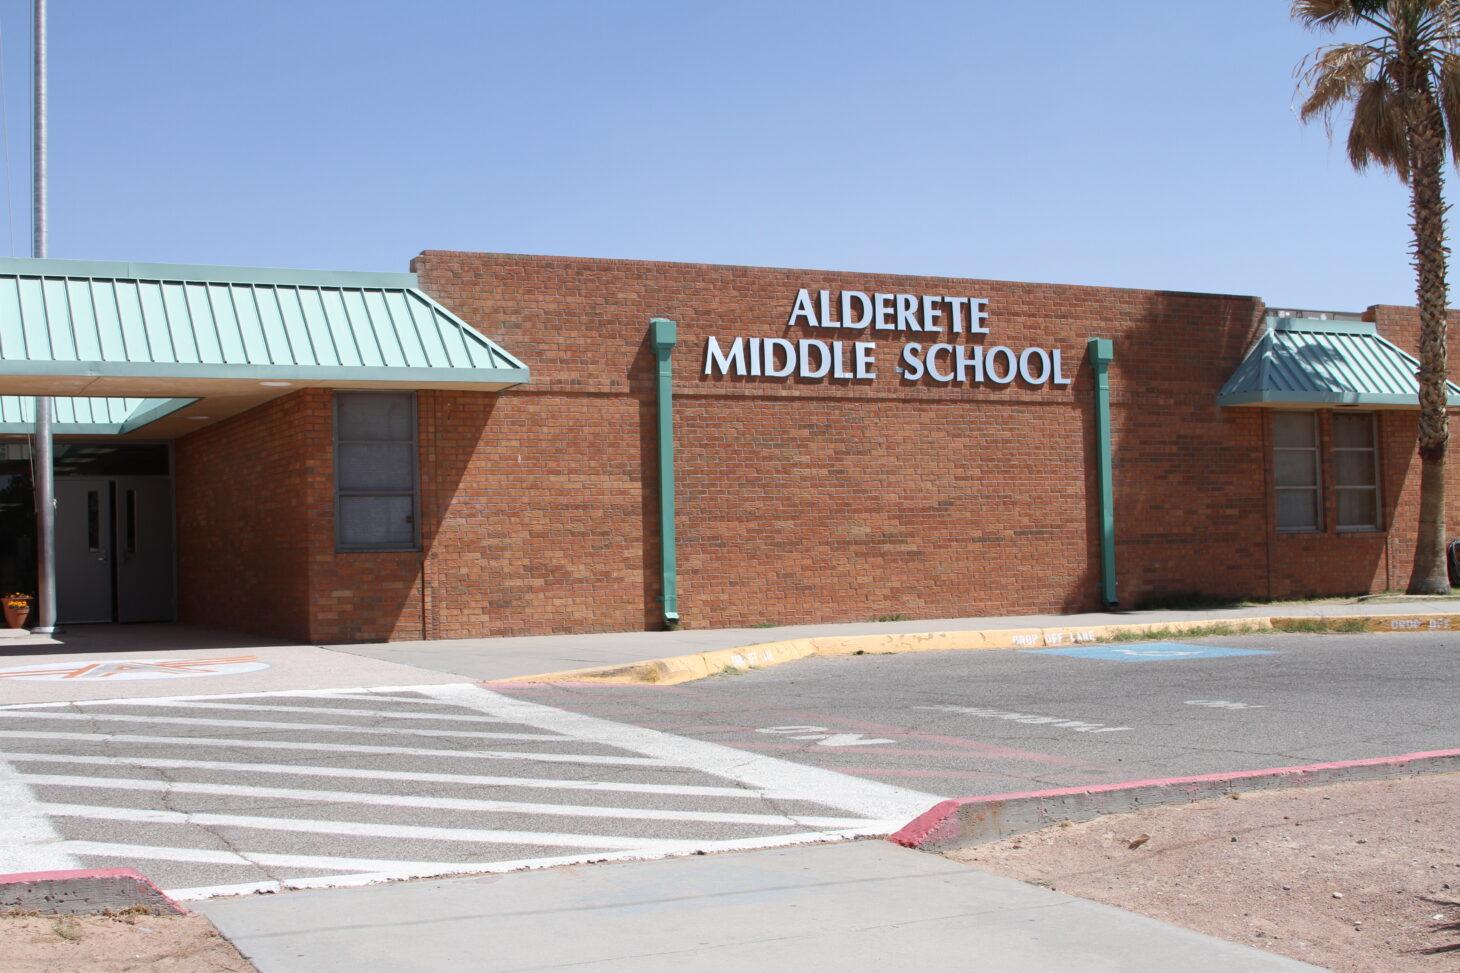 Alderete Middle School exterior